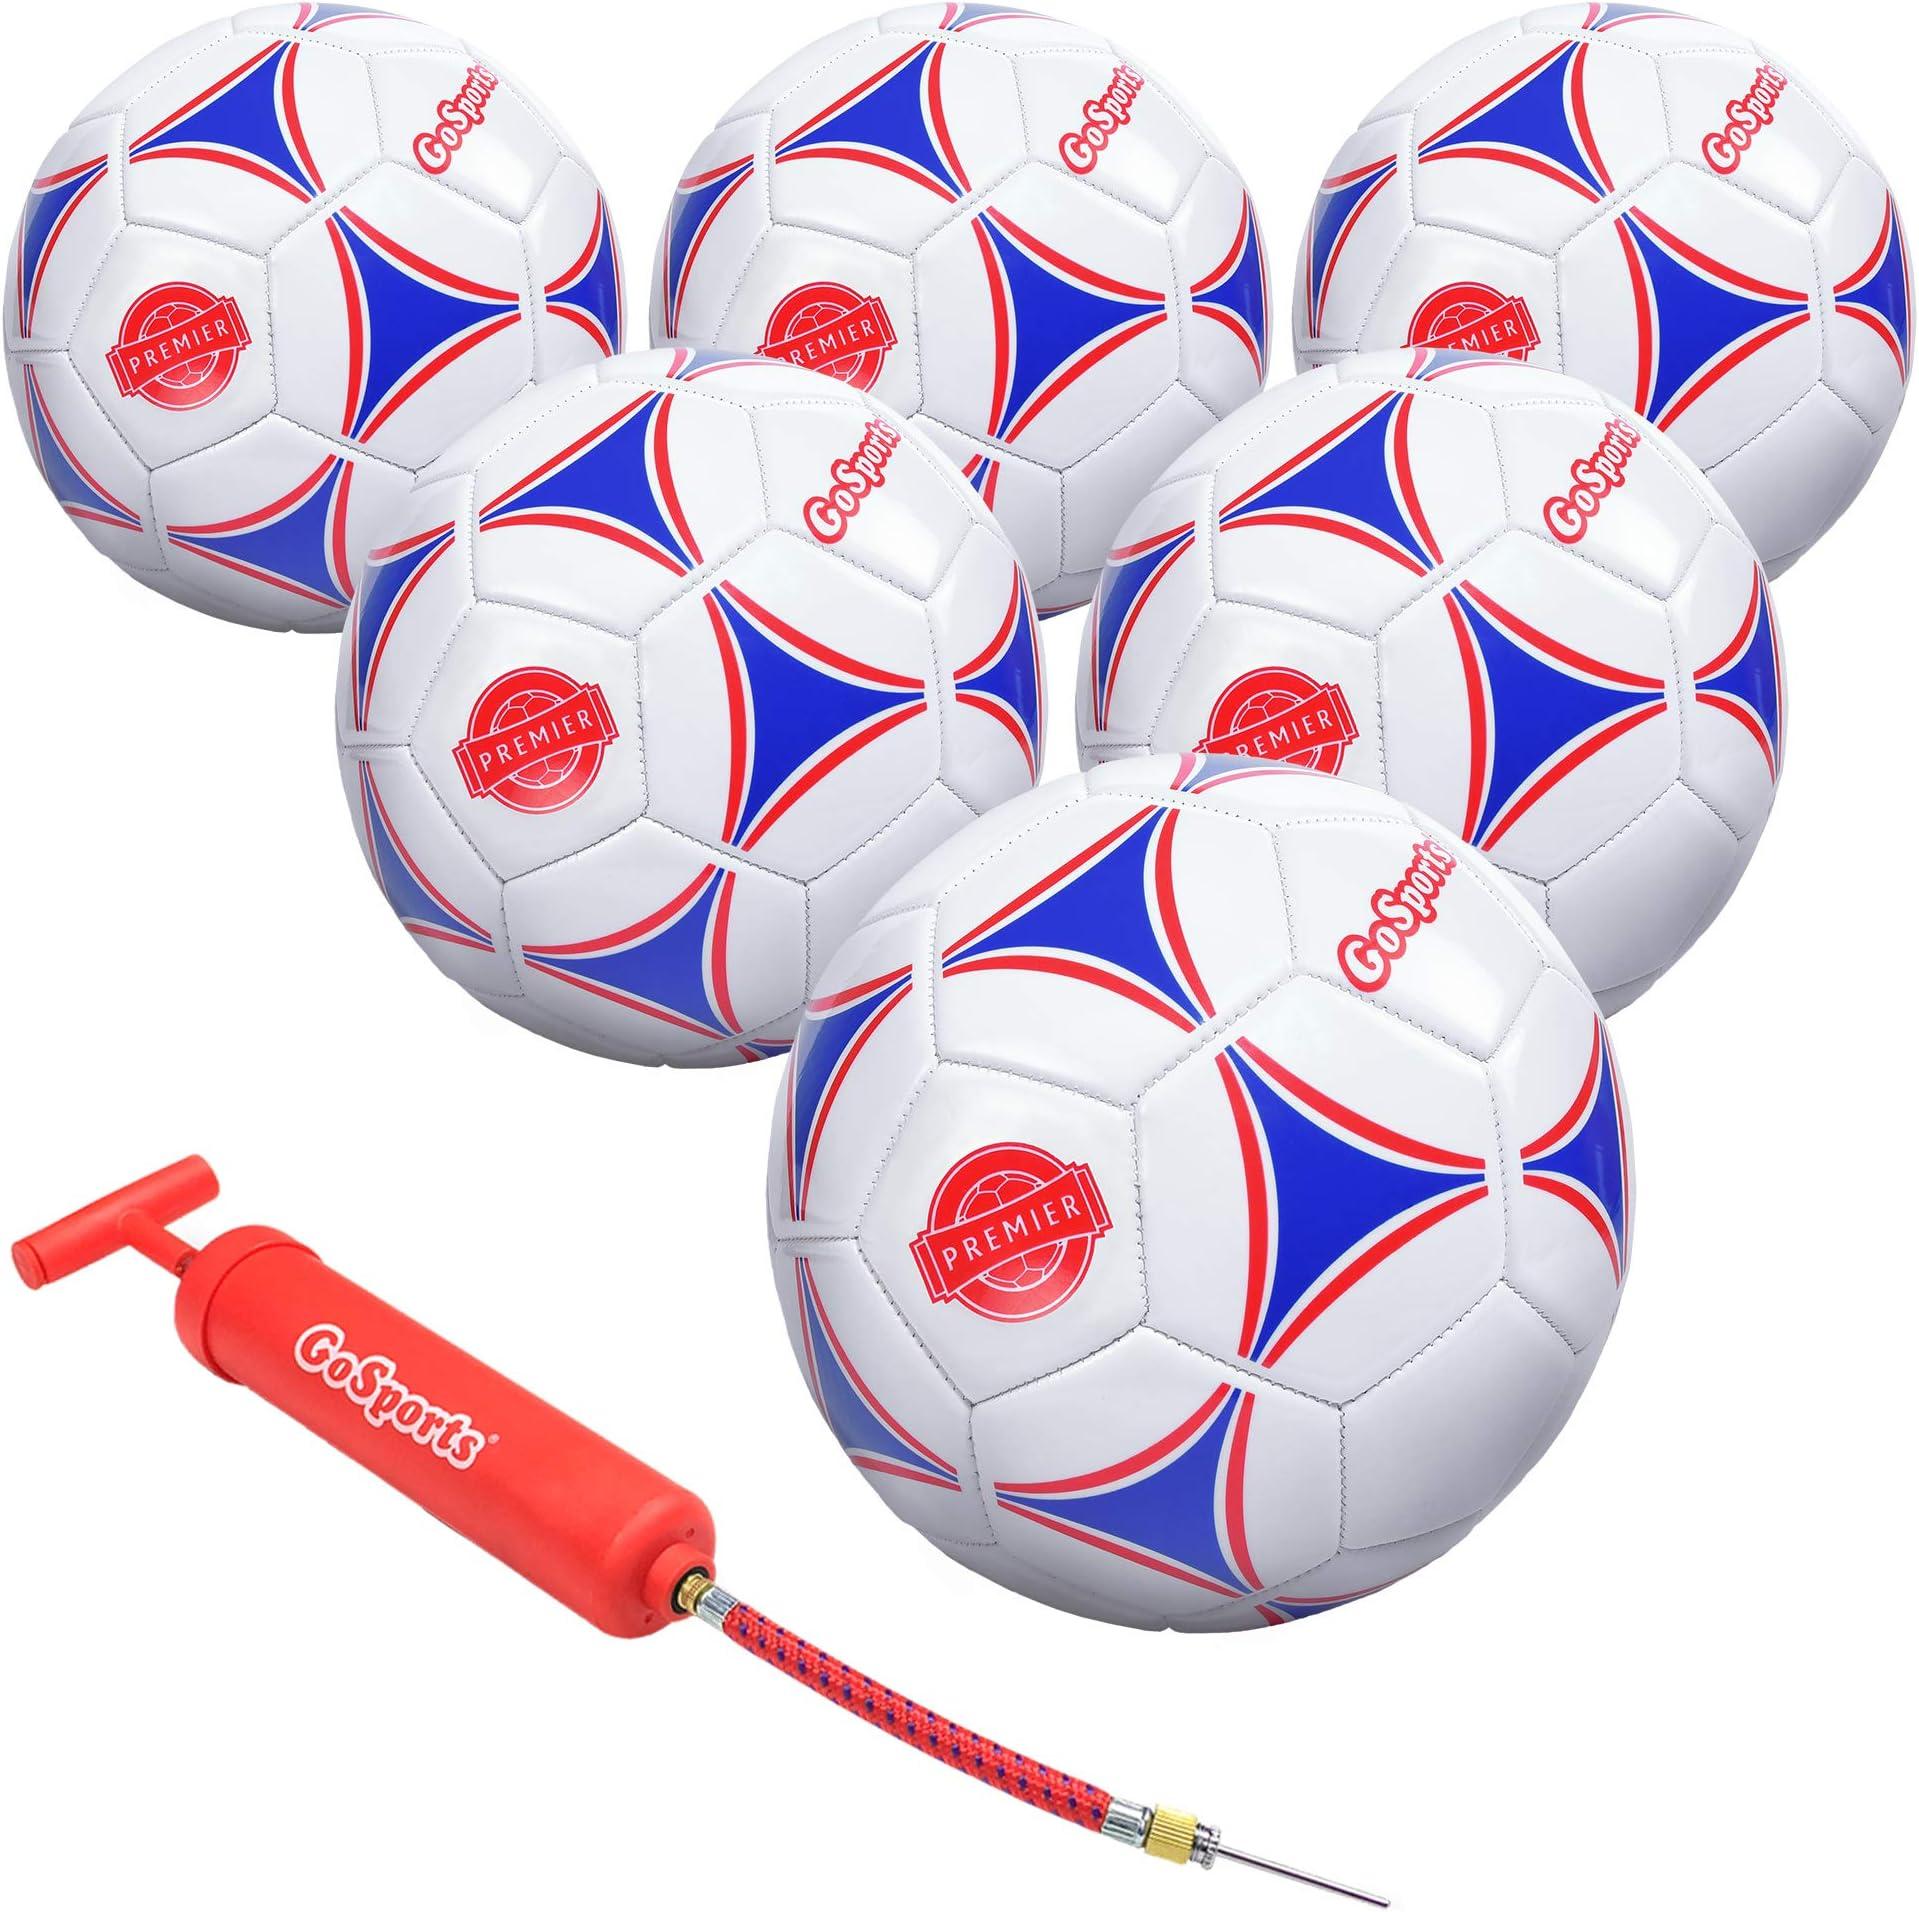 BALL FLICK Premium